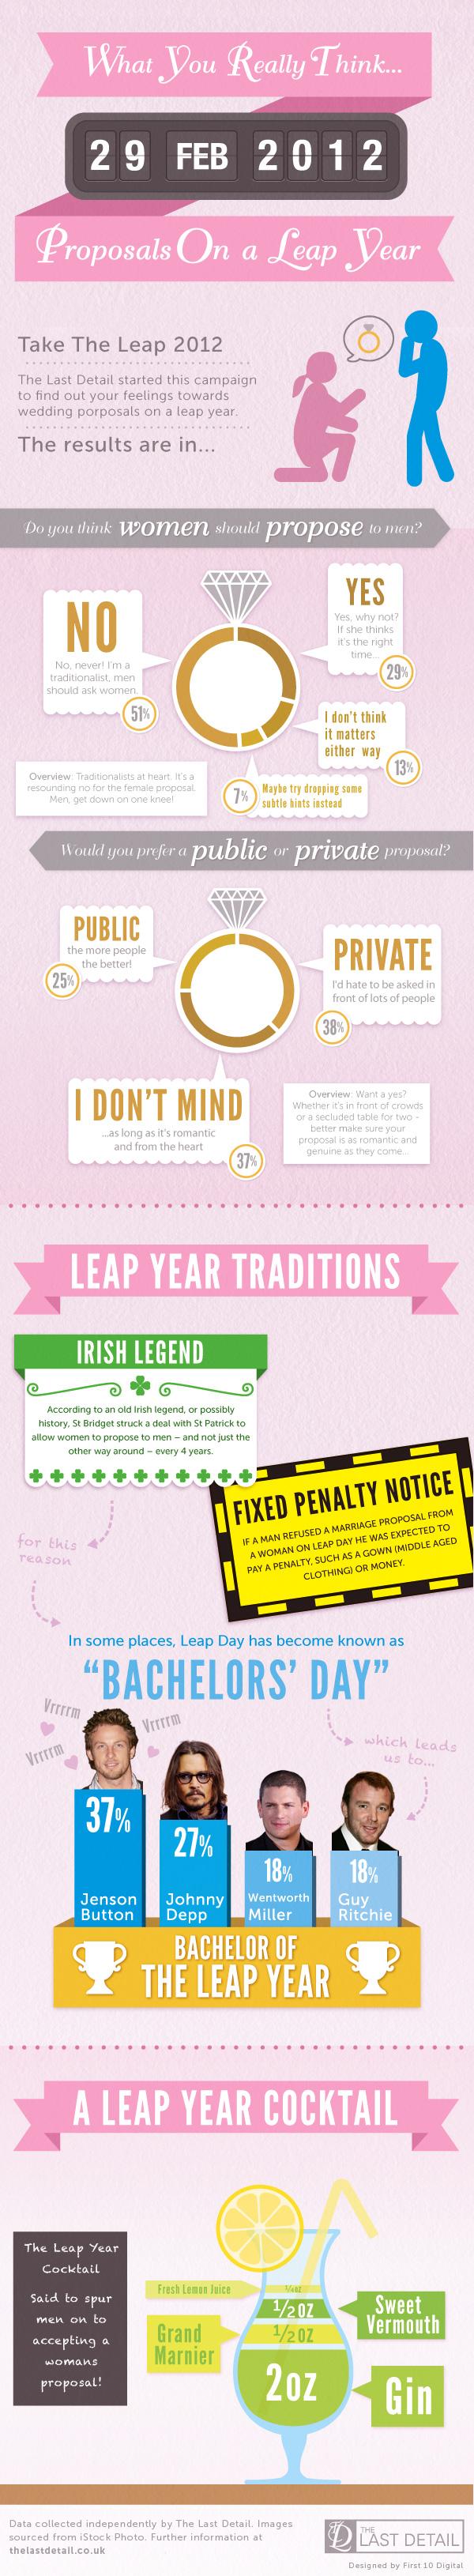 from Leonardo gay marriage leap day